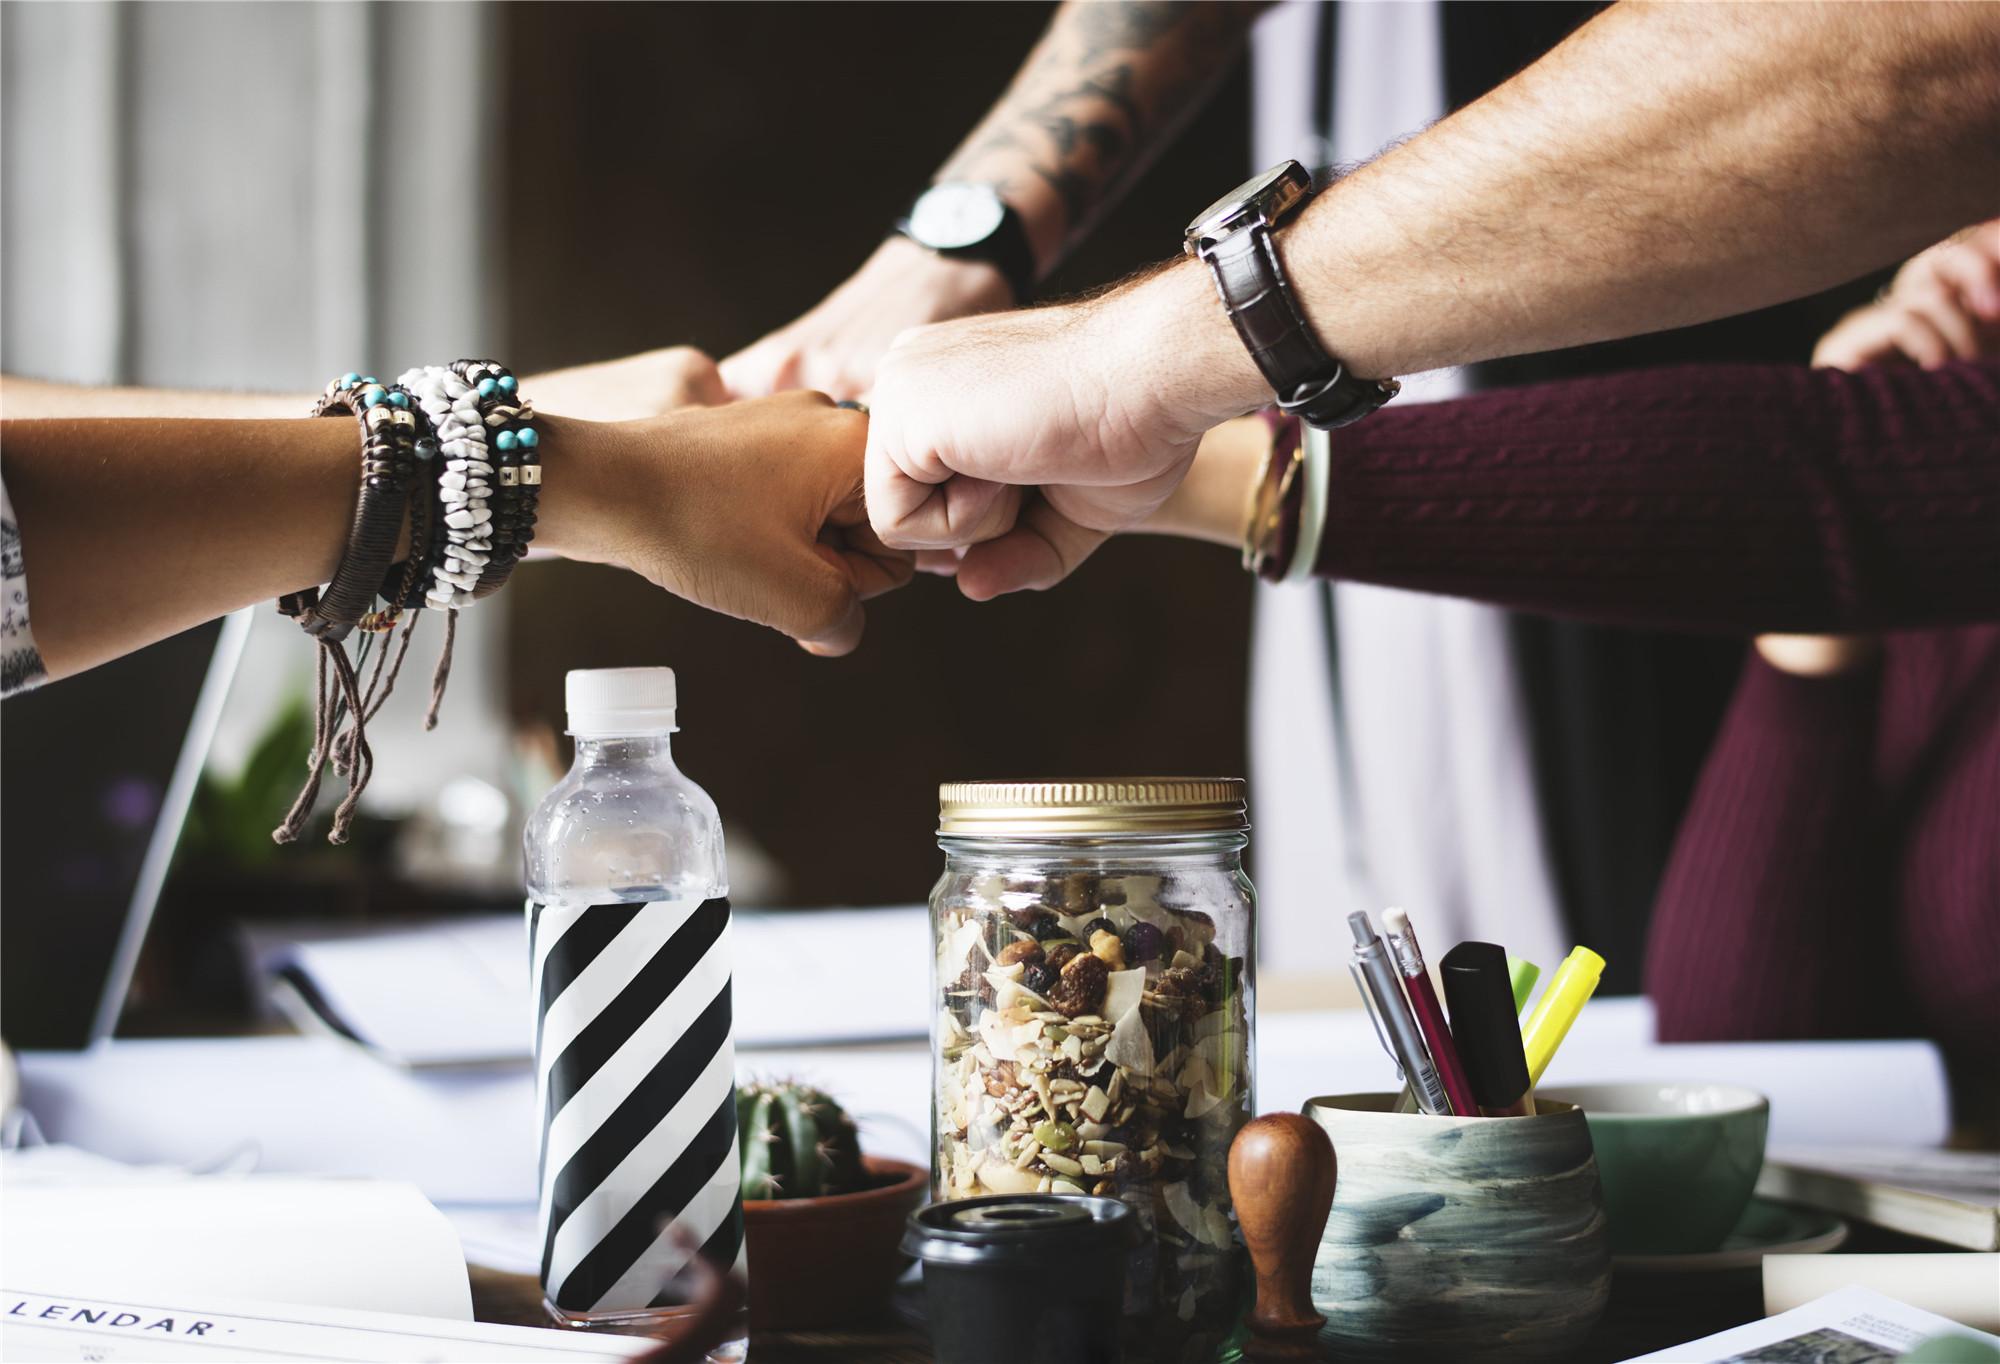 colleagues-cooperation-fist-bump-fists-71f42f94d286f295478f6b3e65e46574